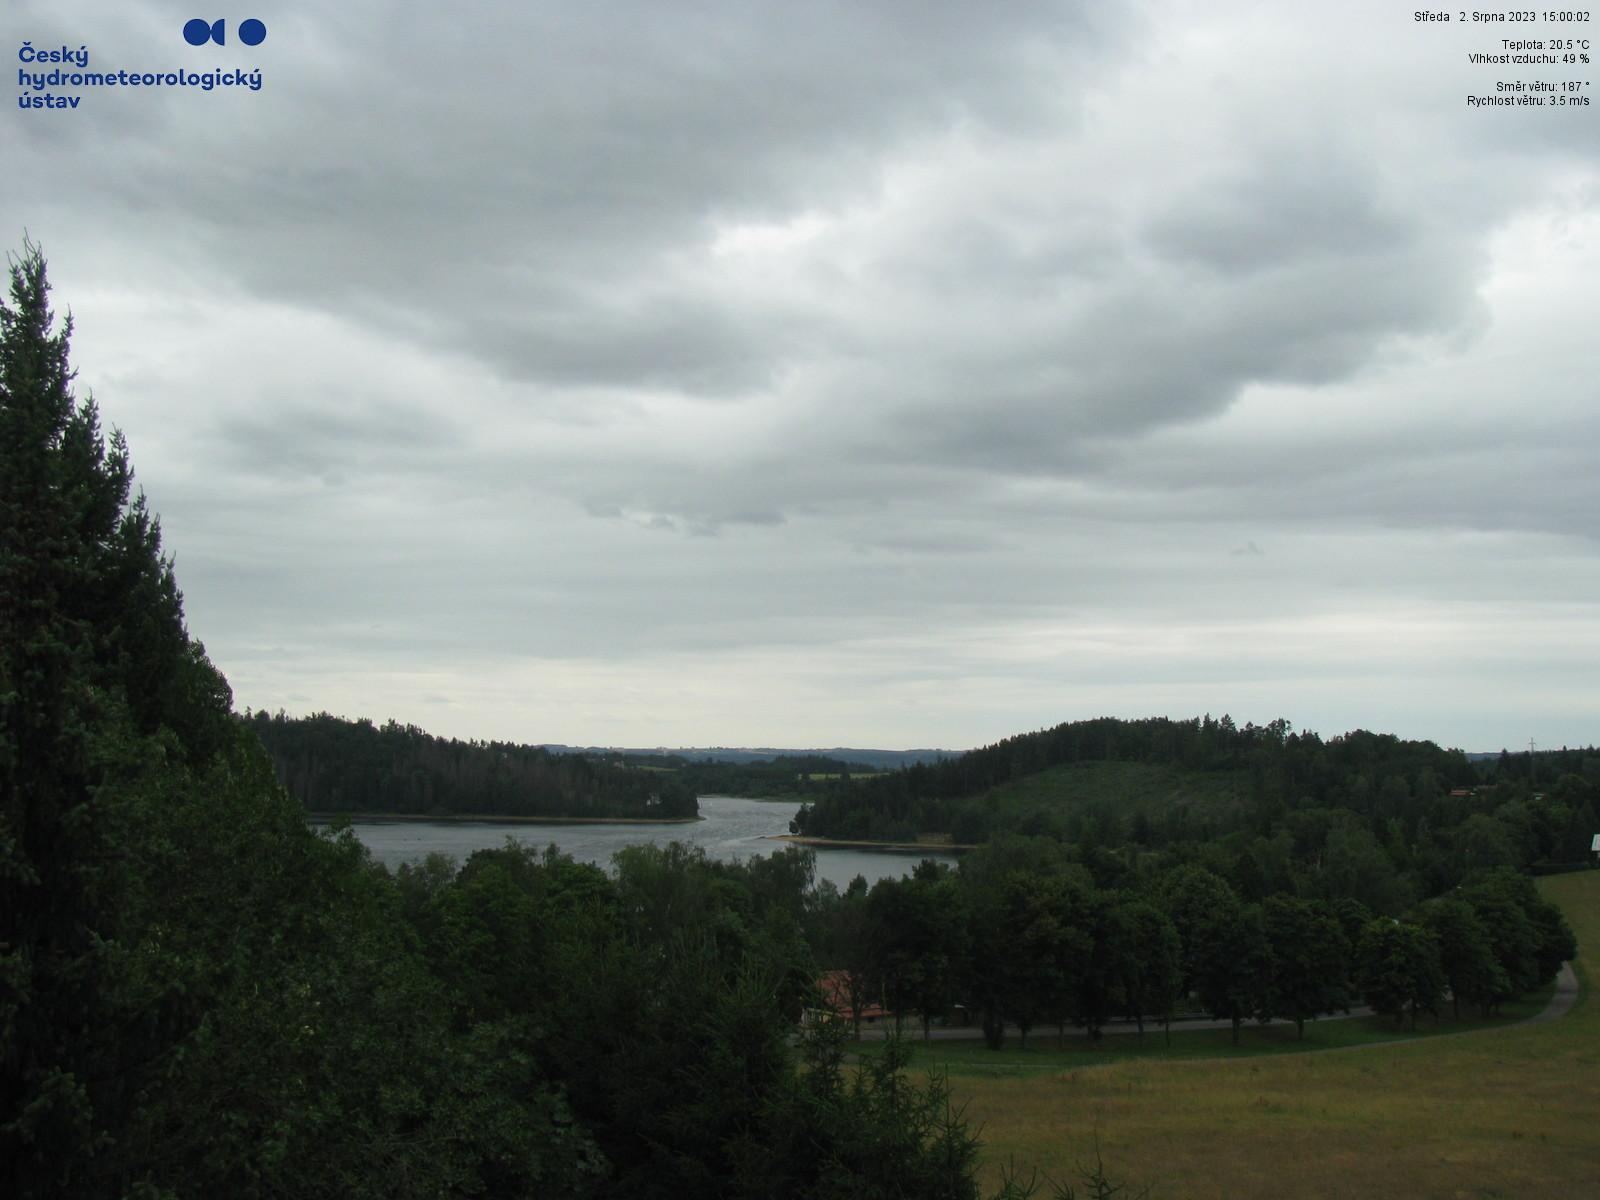 http://portal.chmi.cz/files/portal/docs/meteo/kam/sec.jpg